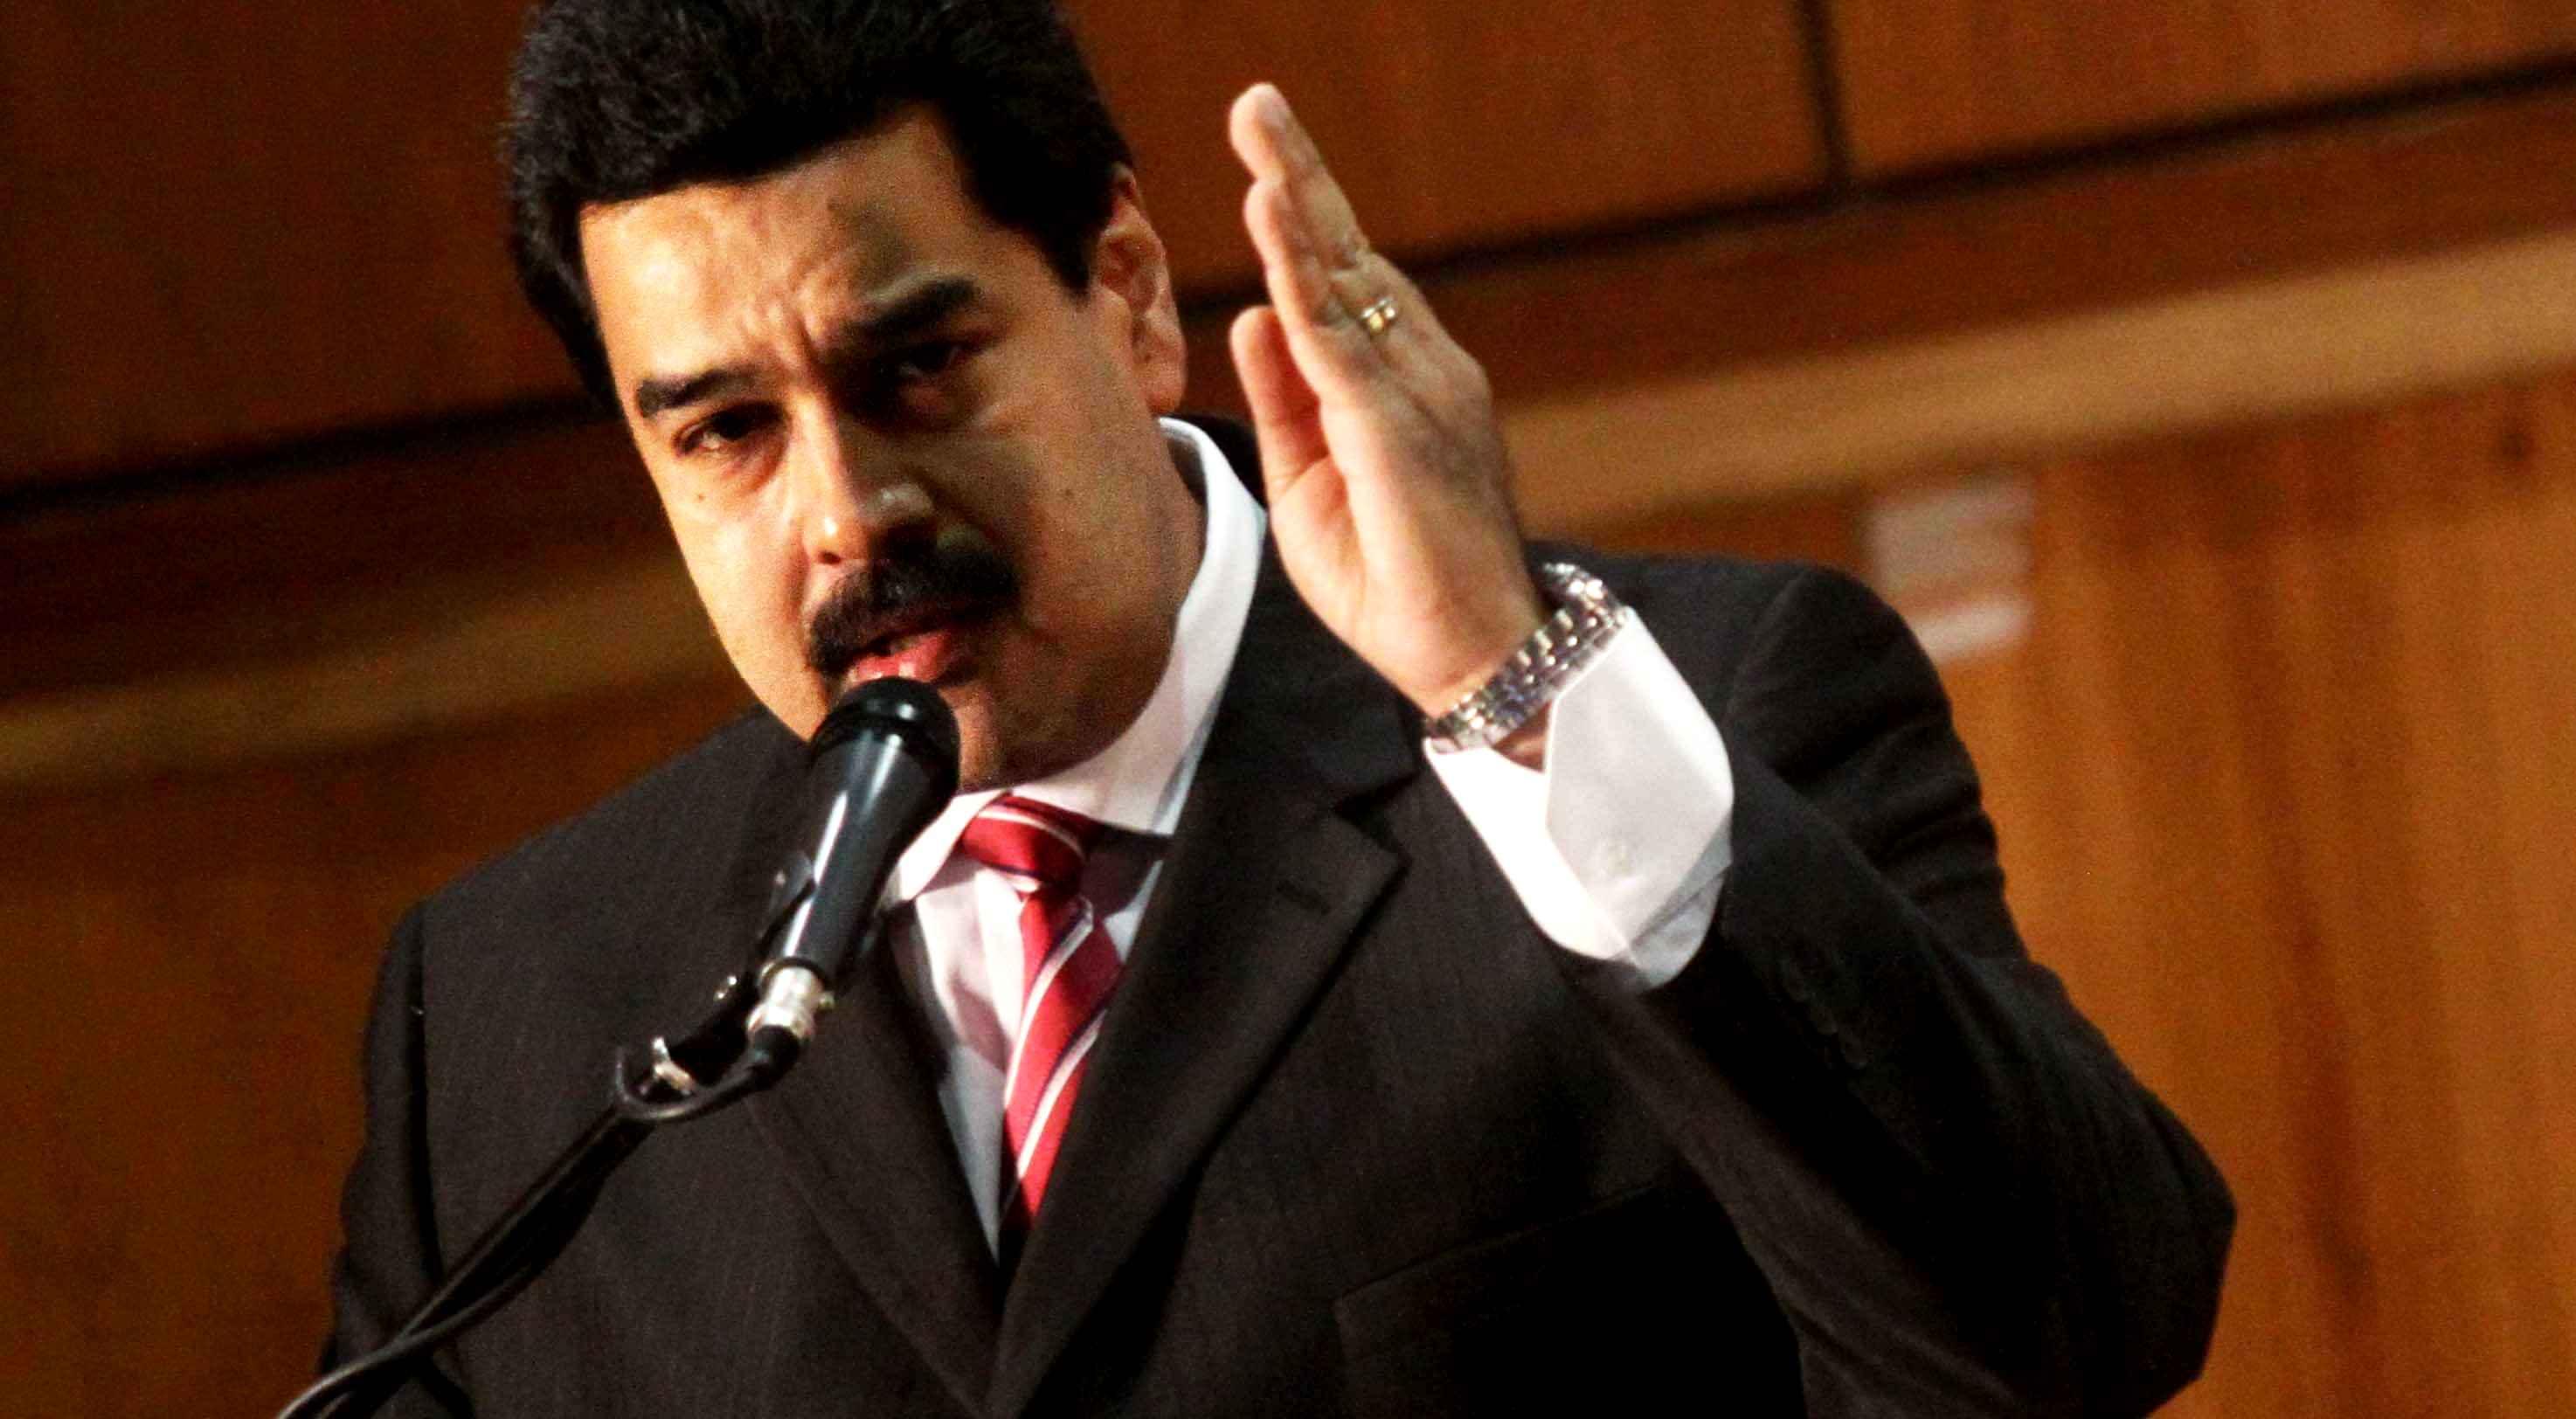 Opositores ven con recelo poderes especiales para Maduro